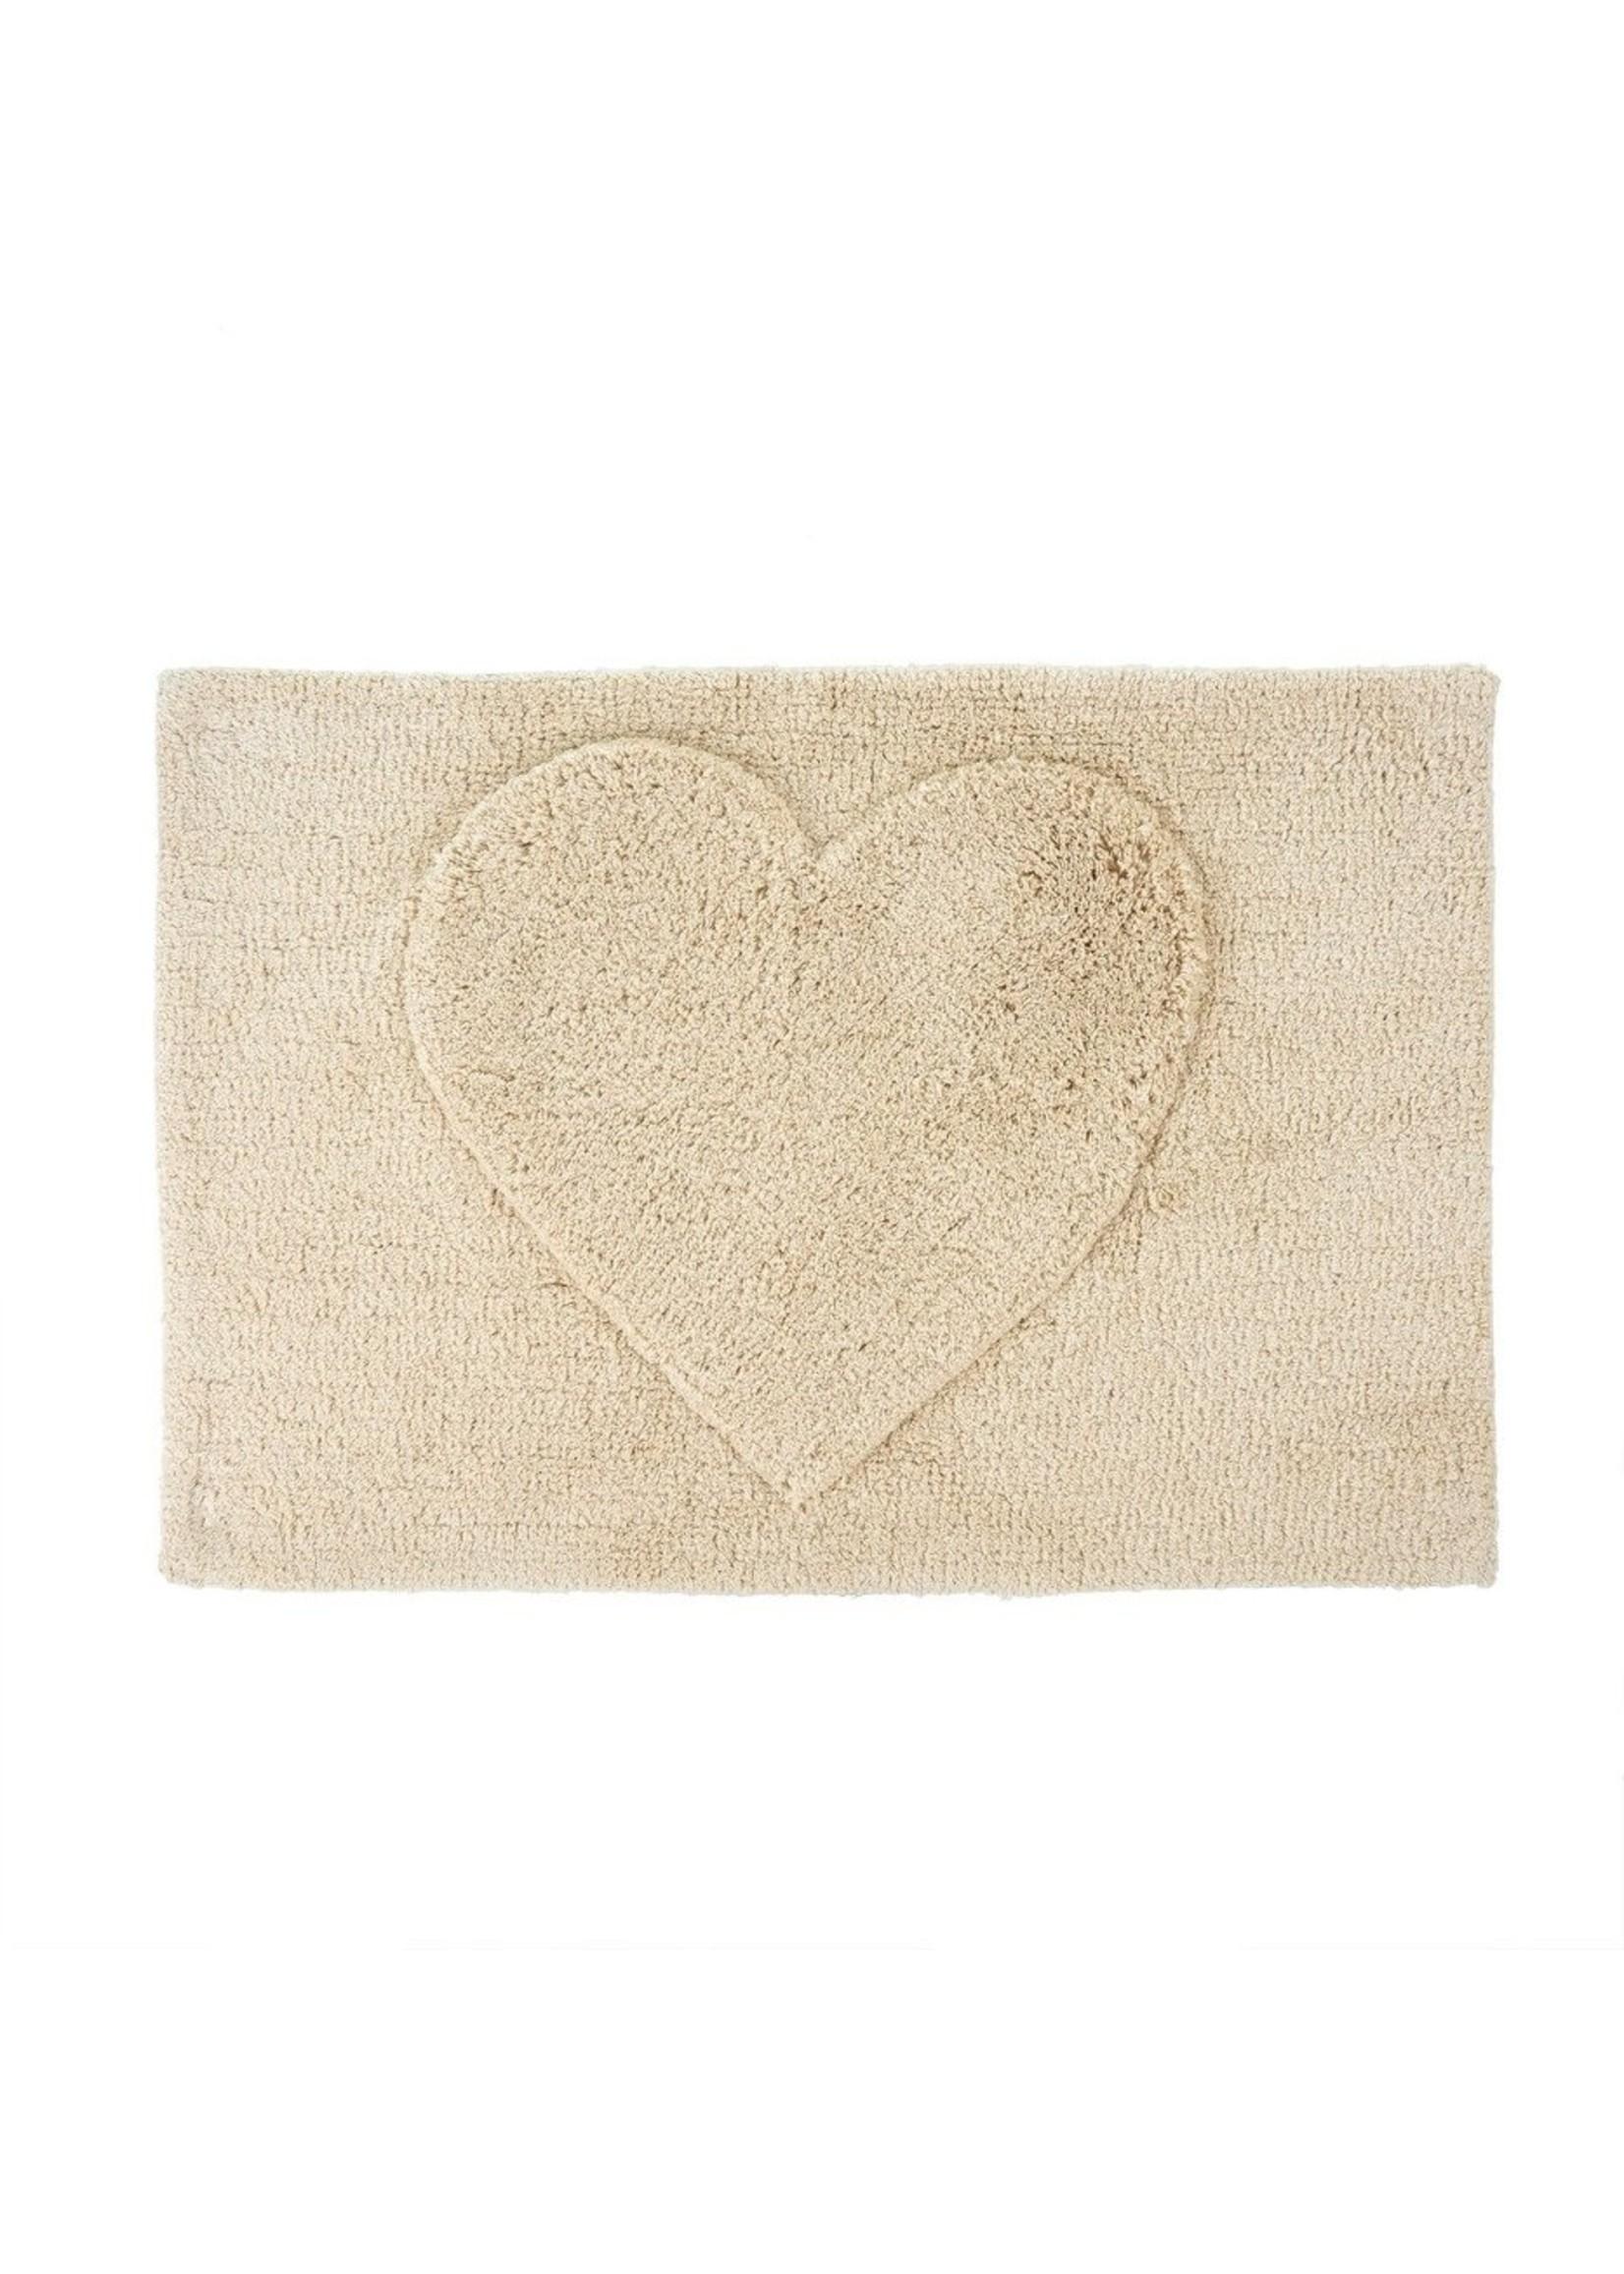 Indaba Trading Co Love Bath Mat